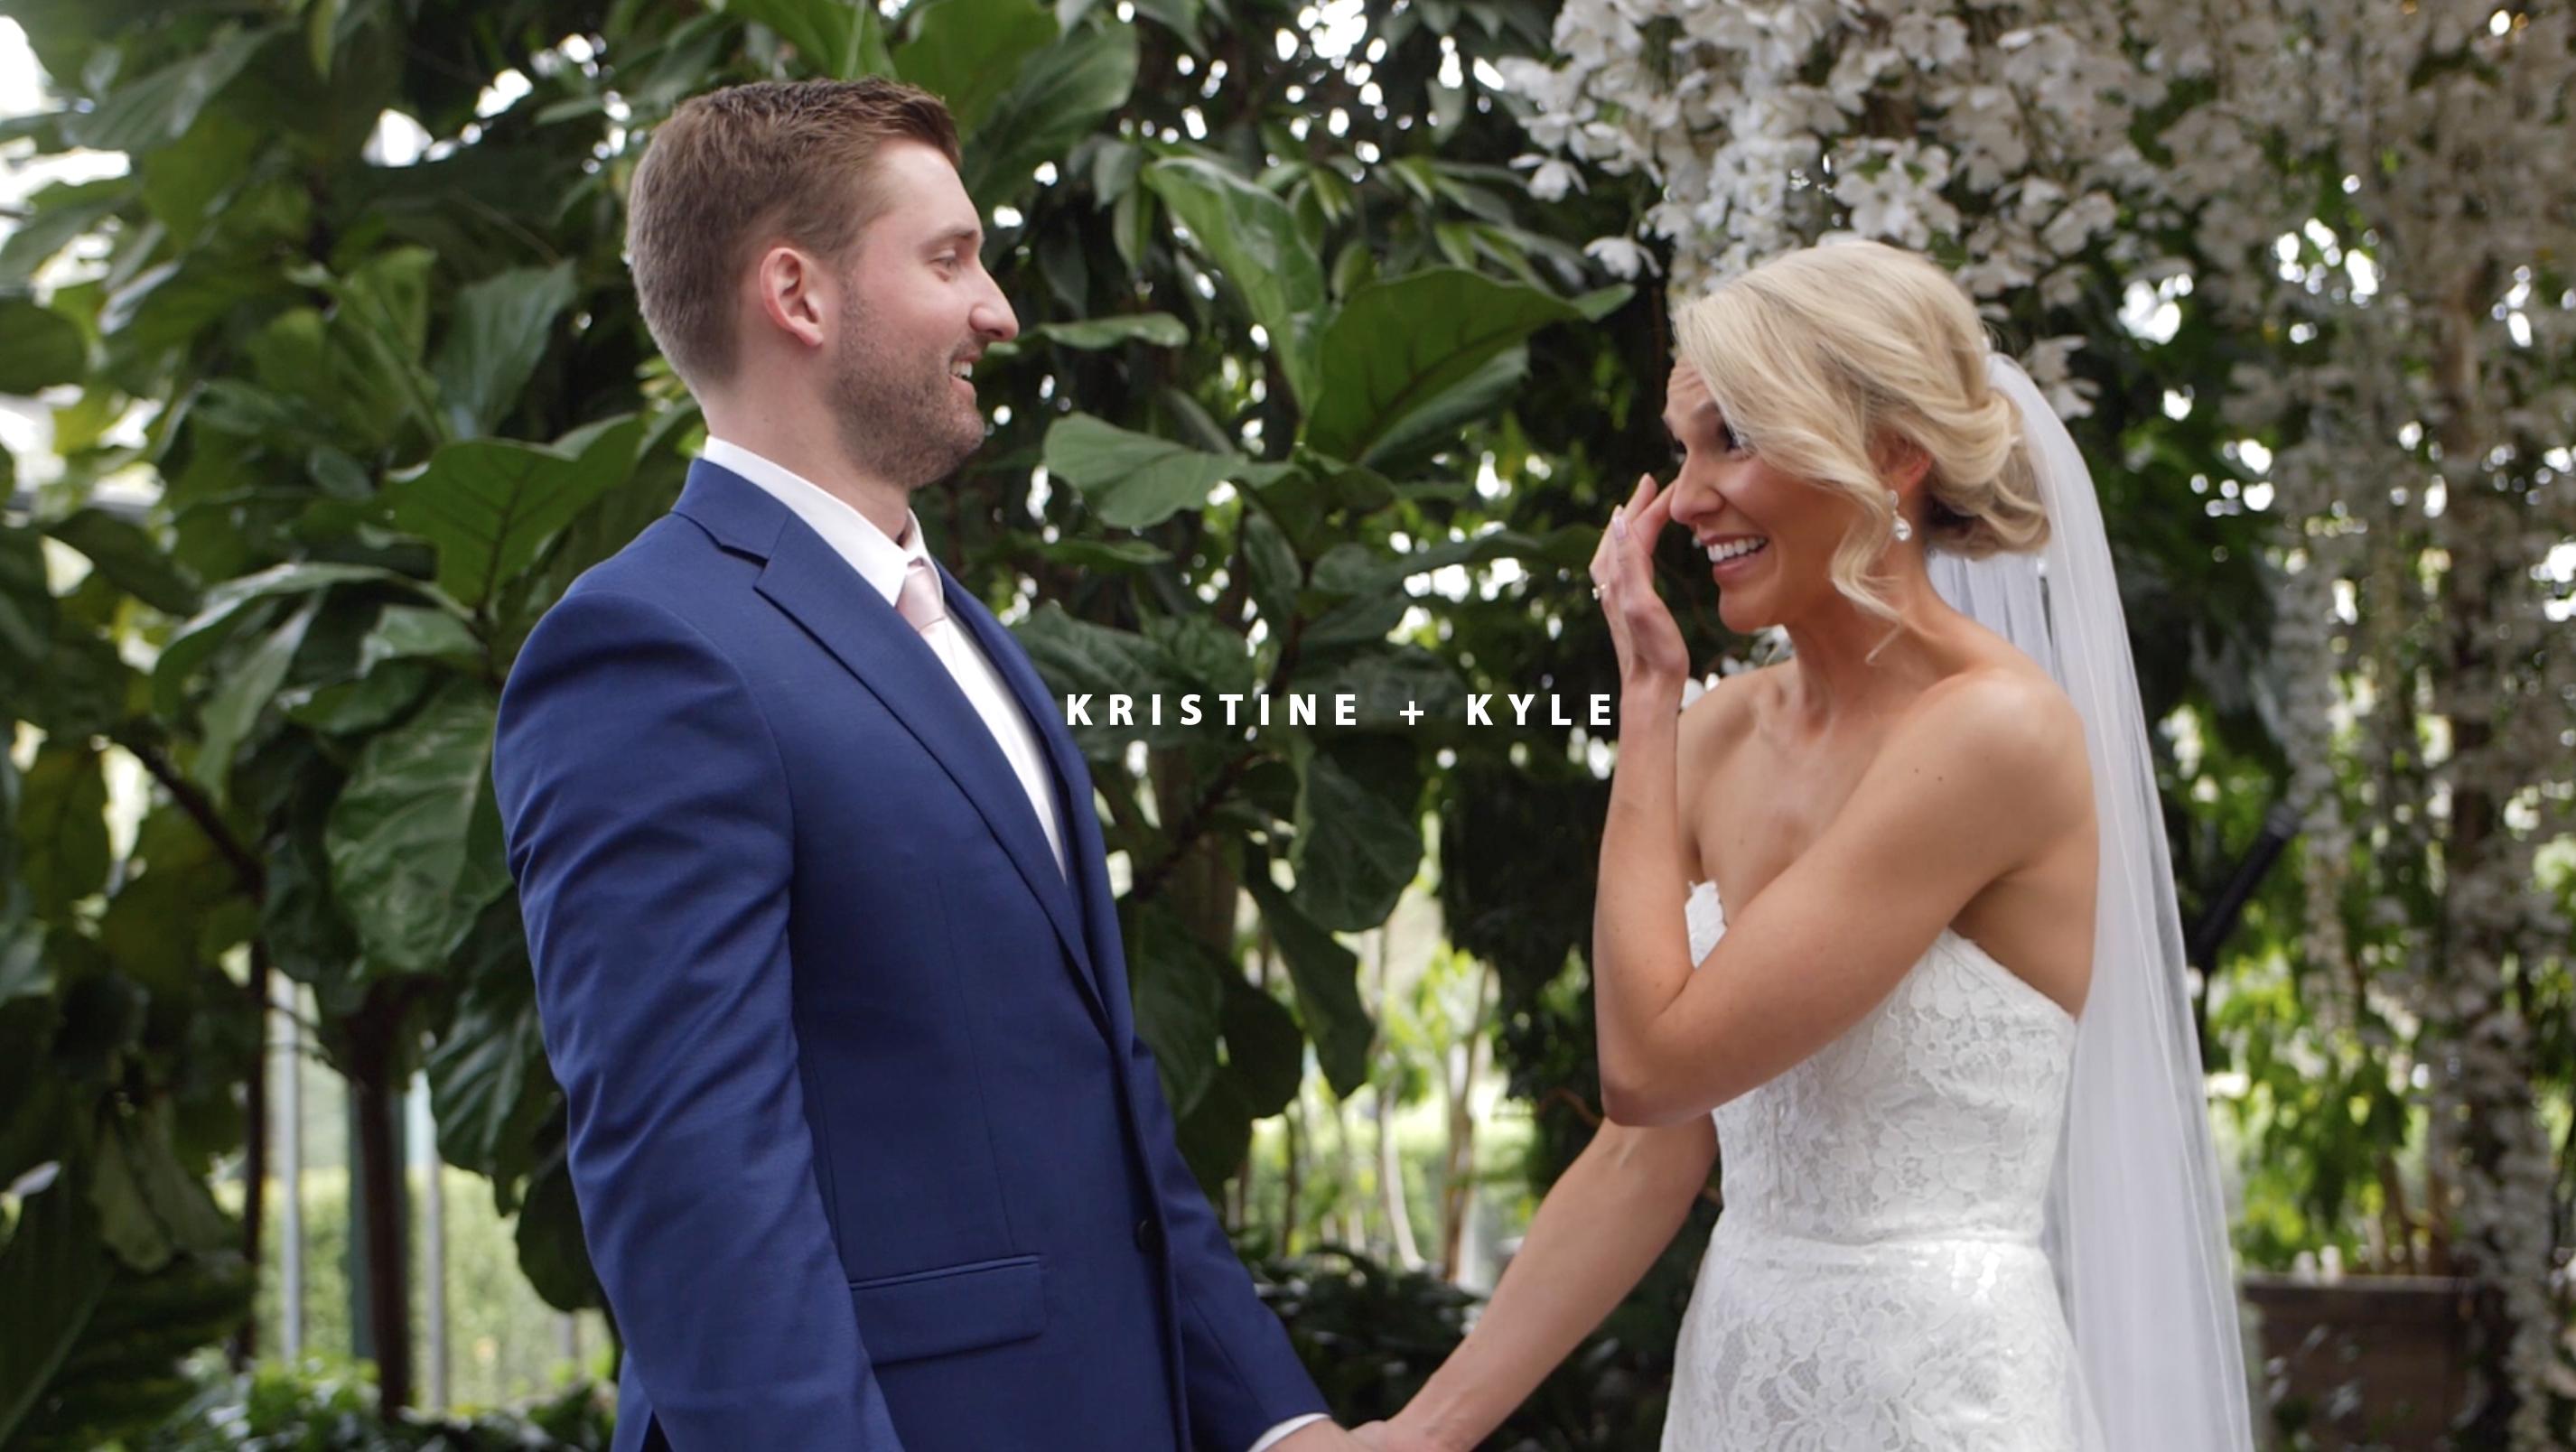 Kristine + Kyle | West Bloomfield Township, Michigan | Planterra Conservatory